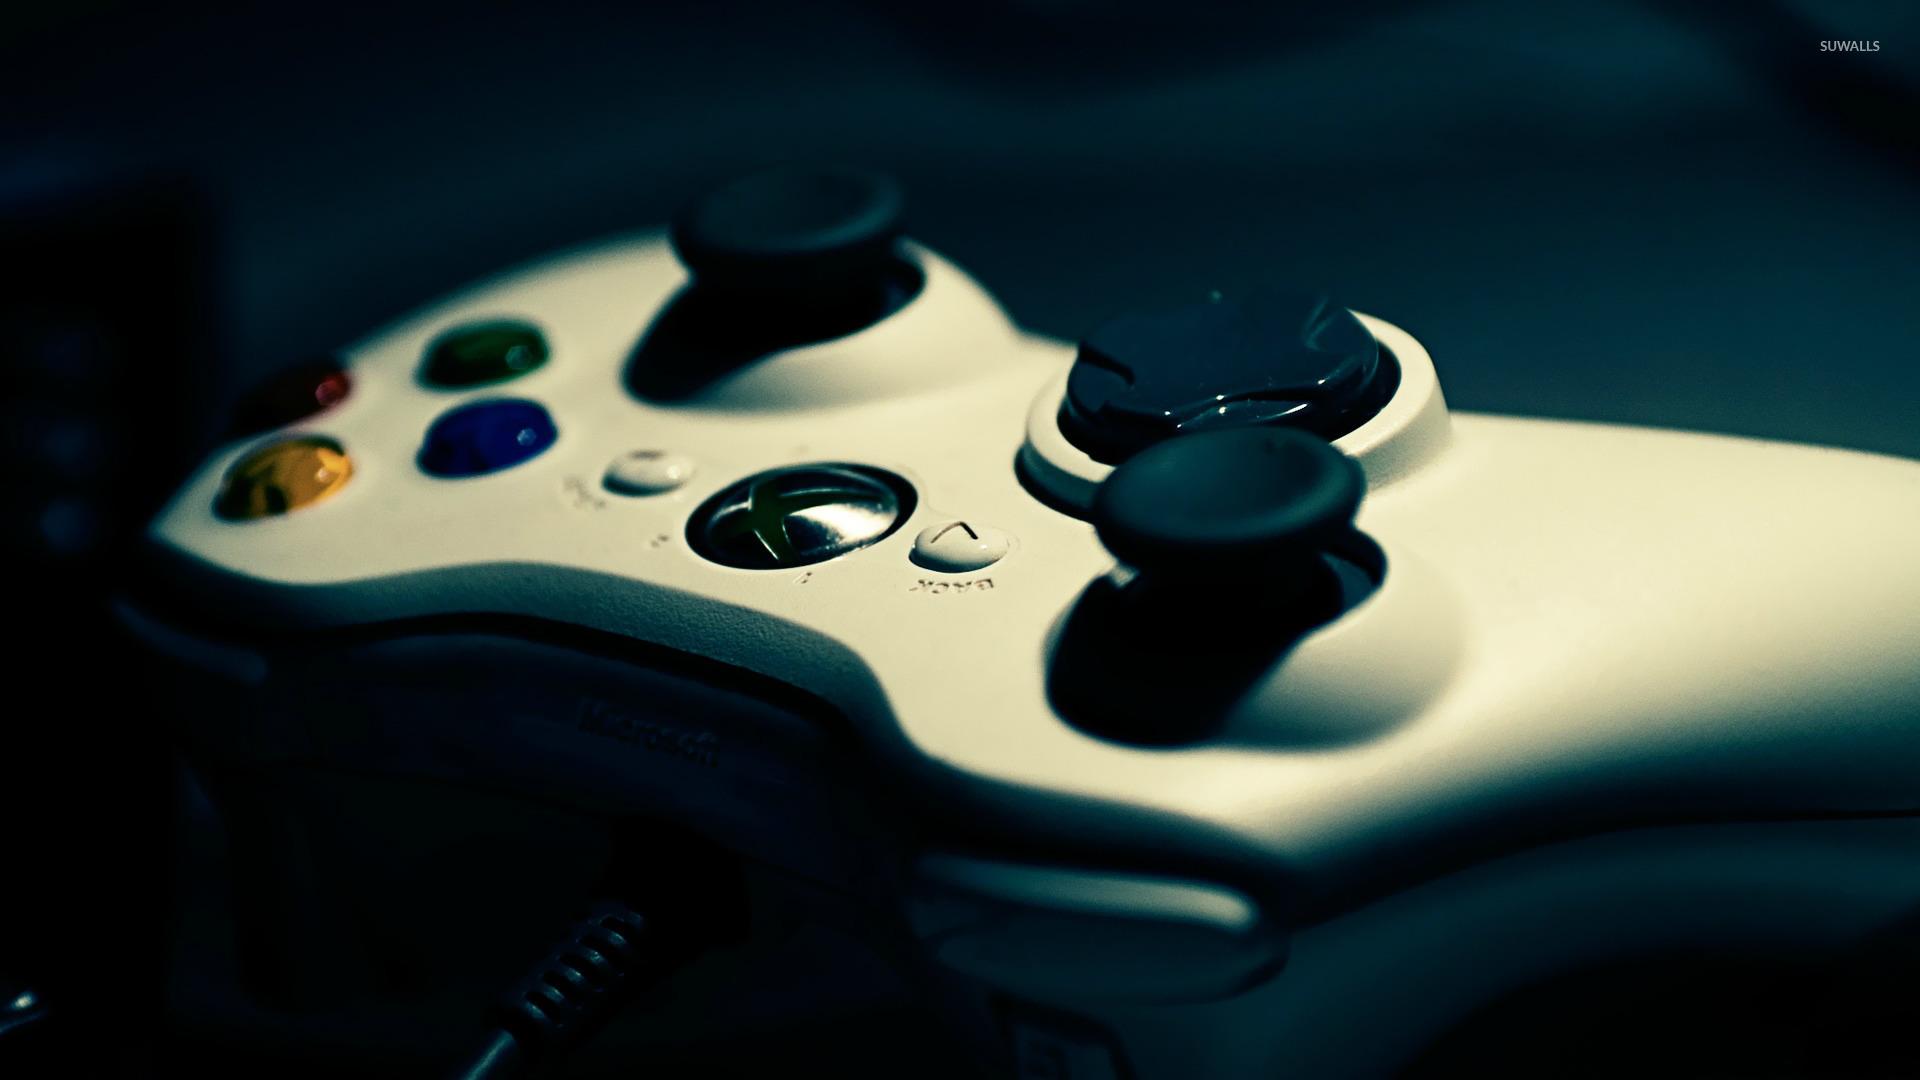 Xbox 360 Controller wallpaper  ForWallpapercom